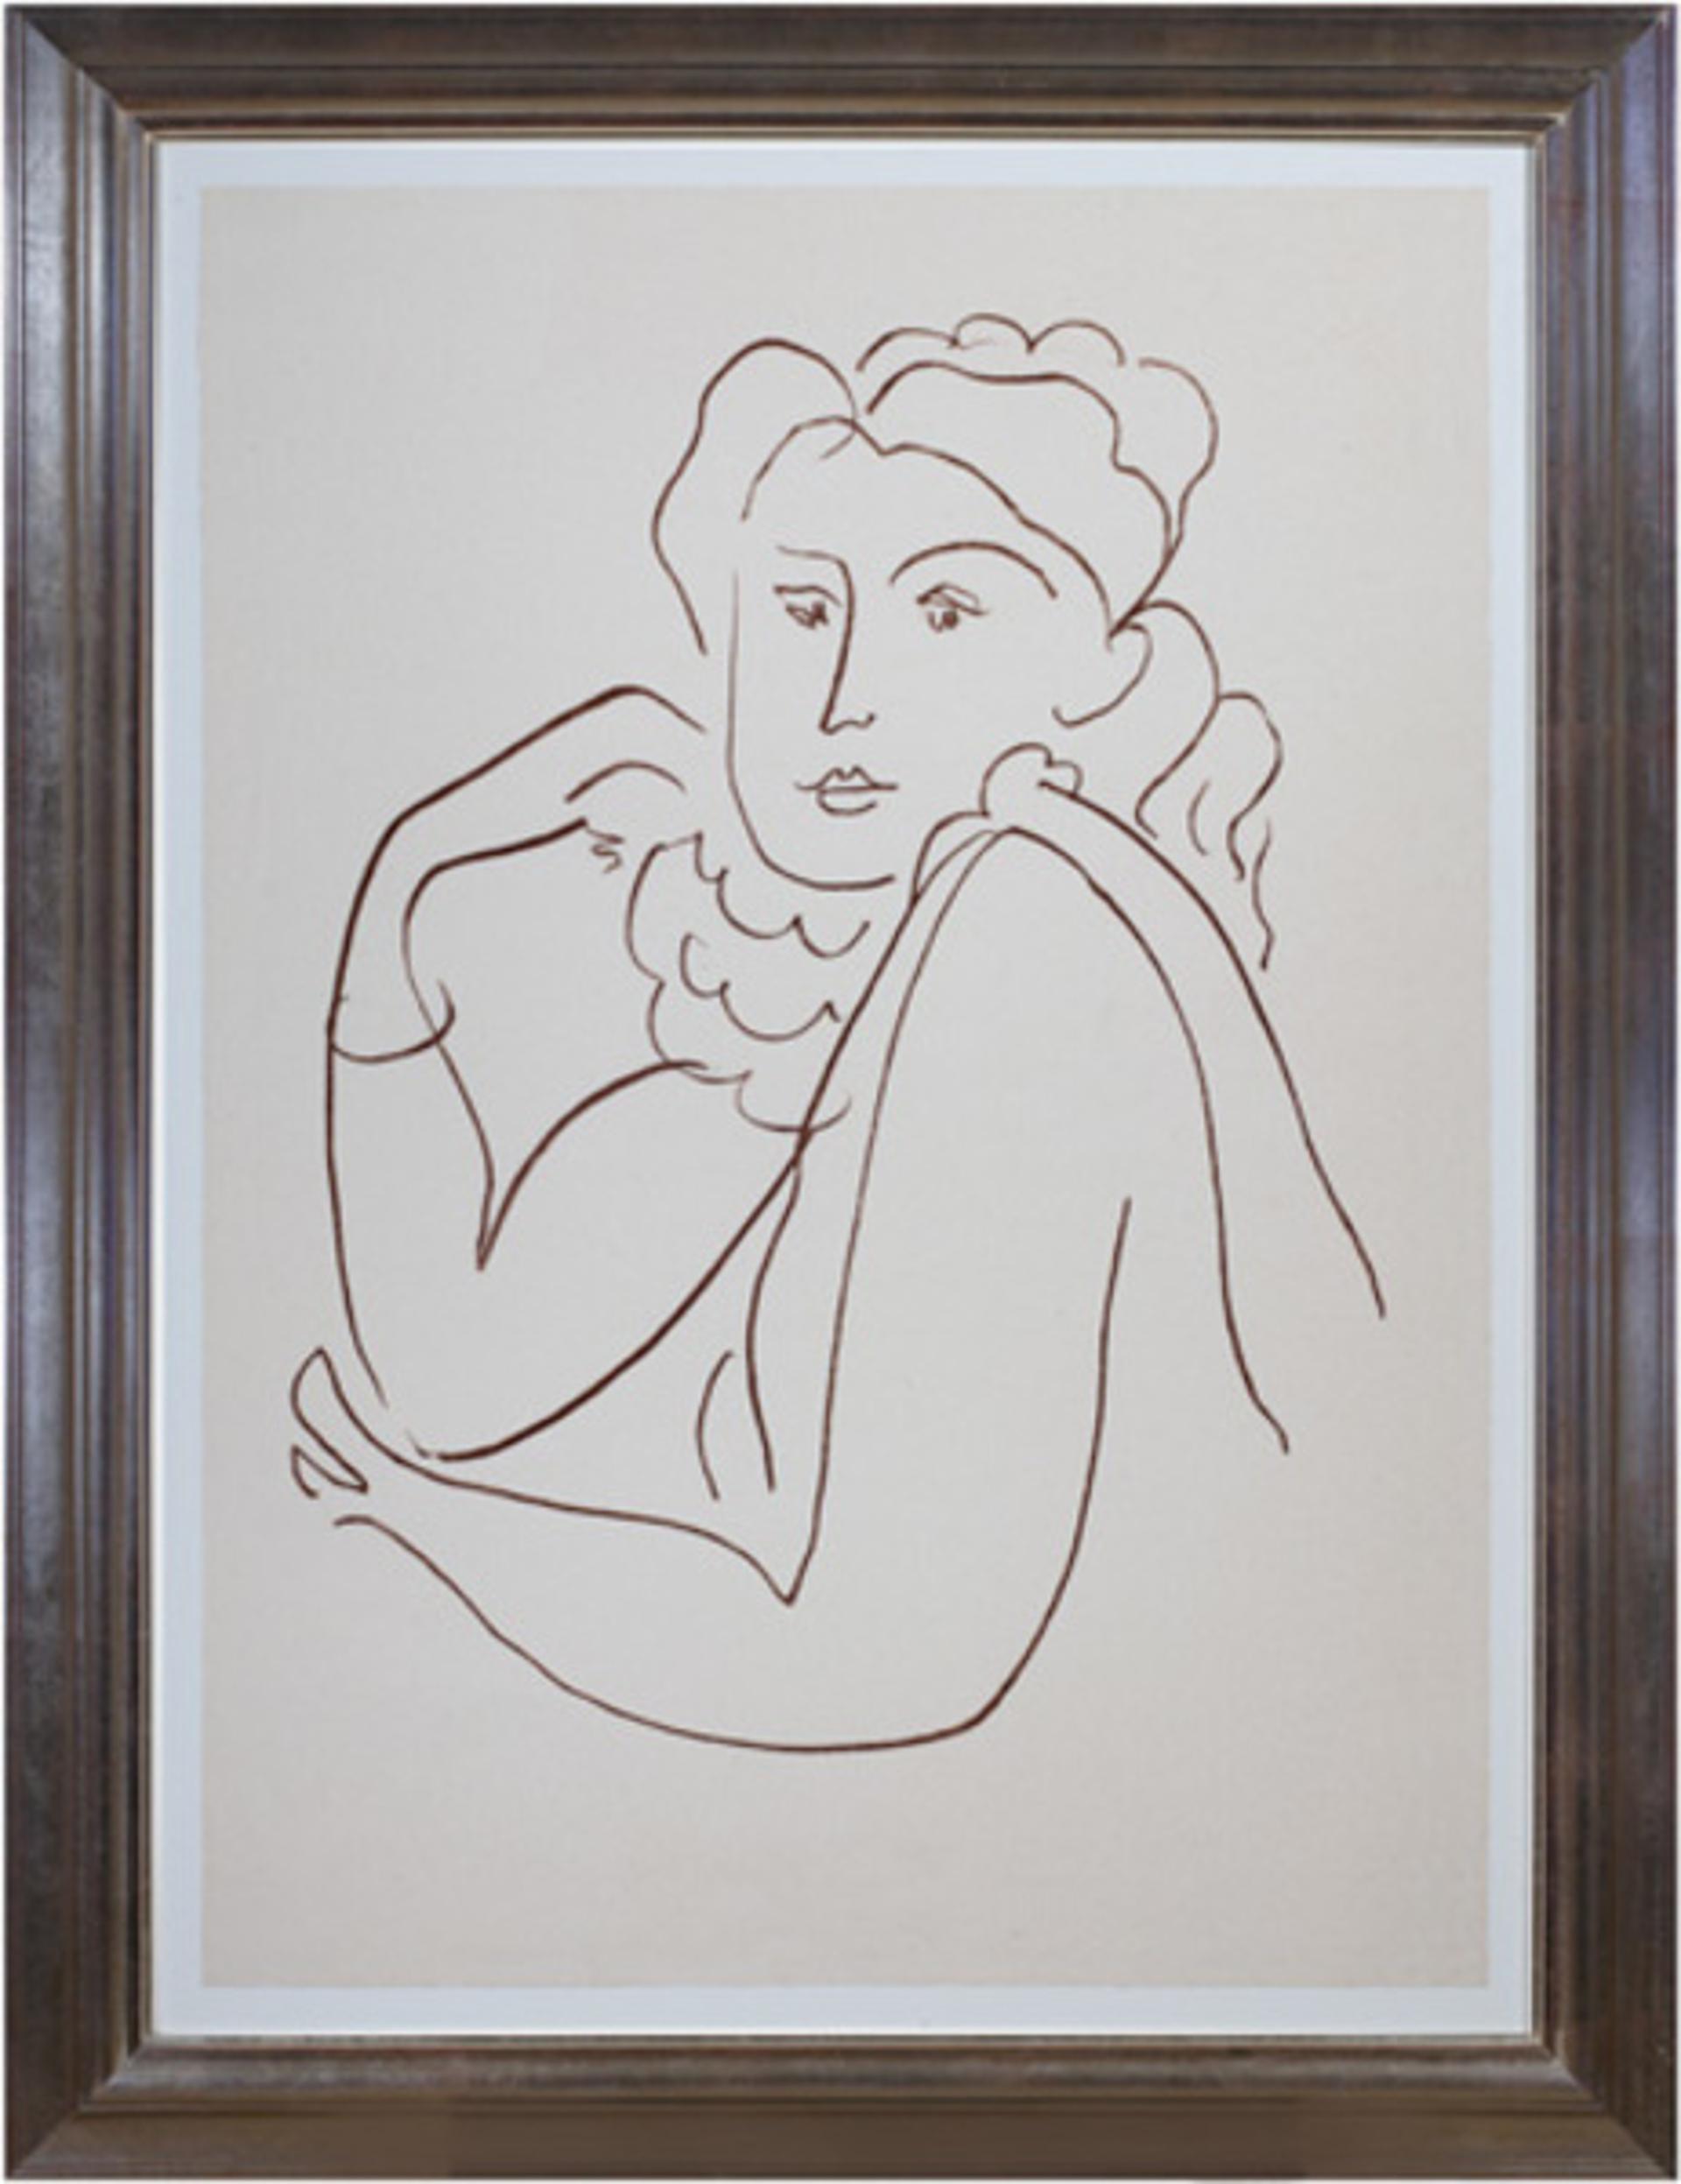 Woman w/Ruffled Collar (from Florilege des Amours de Ronsard Portfolio) by Henri Matisse